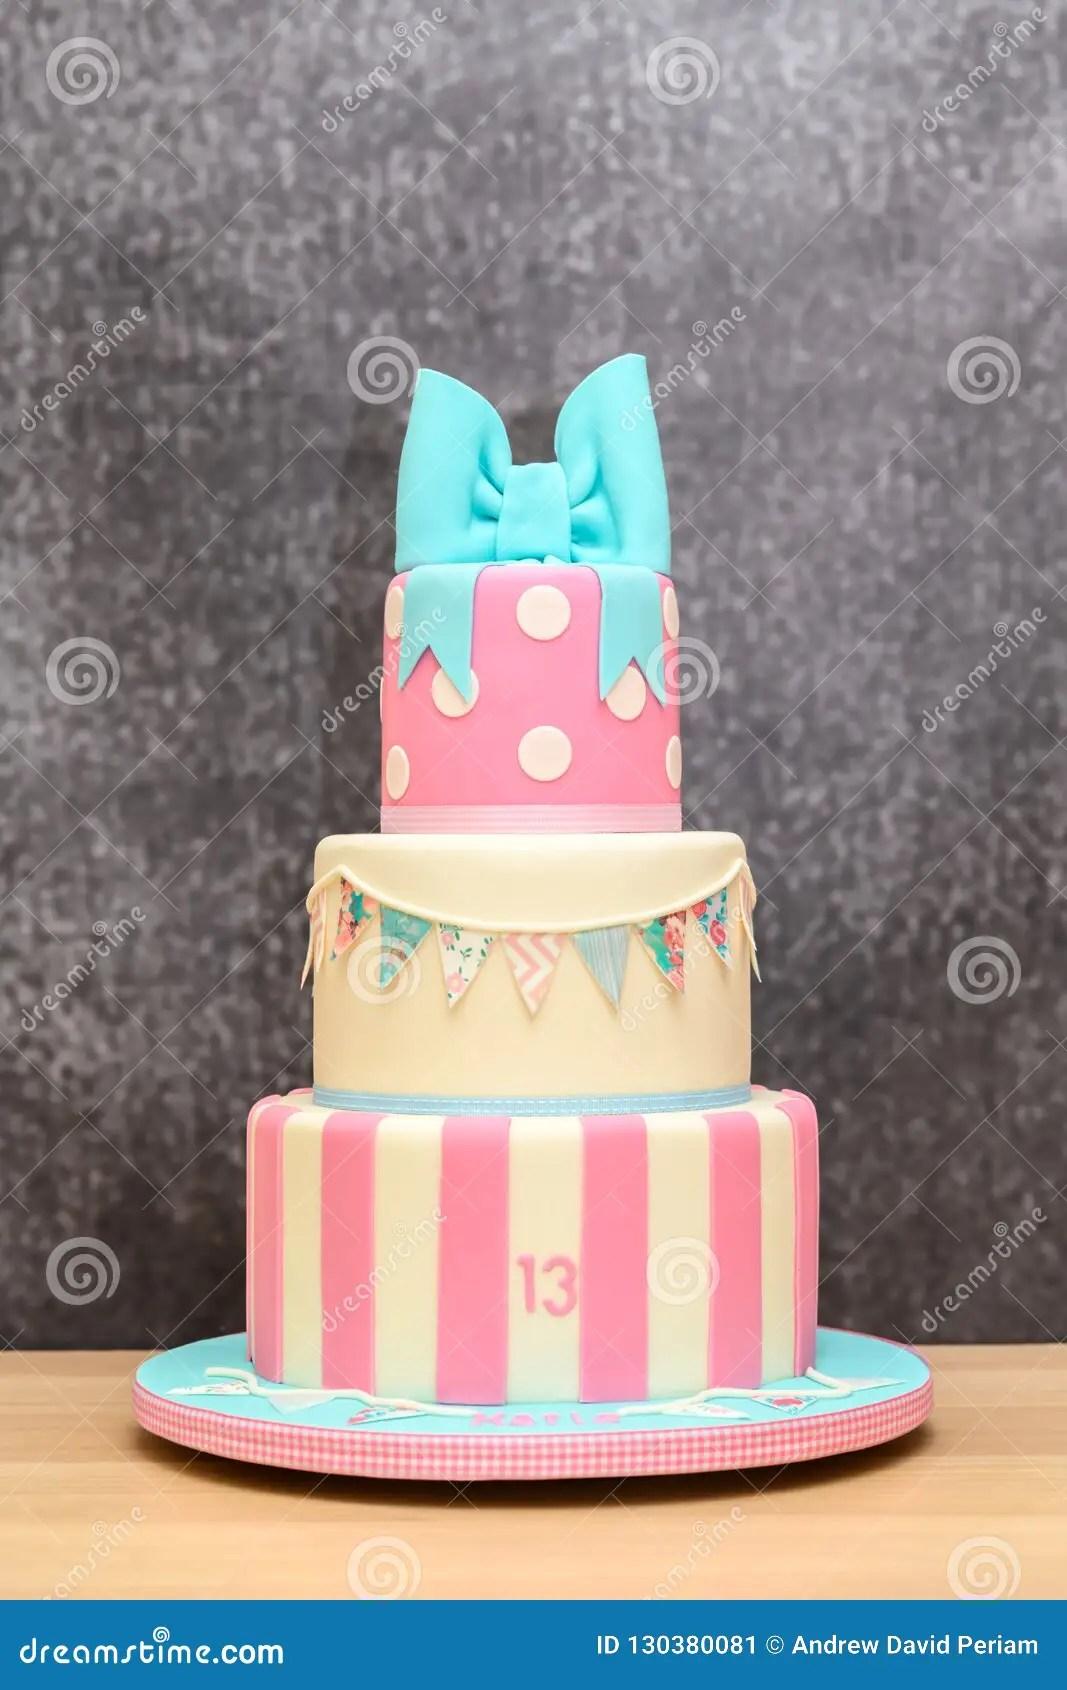 270 Three Tier Birthday Cake Photos Free Royalty Free Stock Photos From Dreamstime